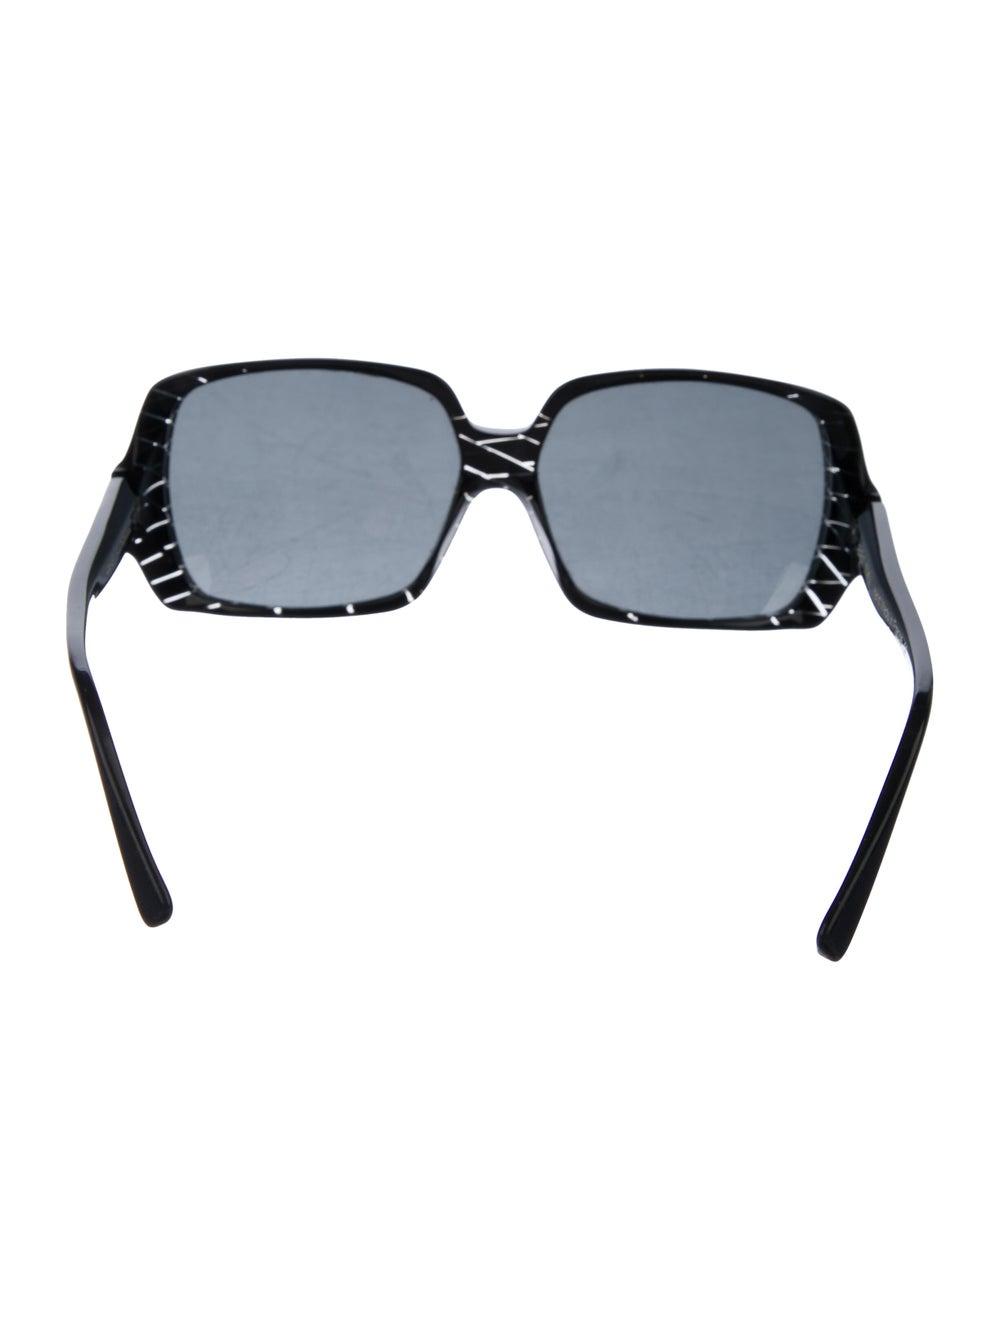 Alain Mikli Tinted Square Sunglasses Black - image 3